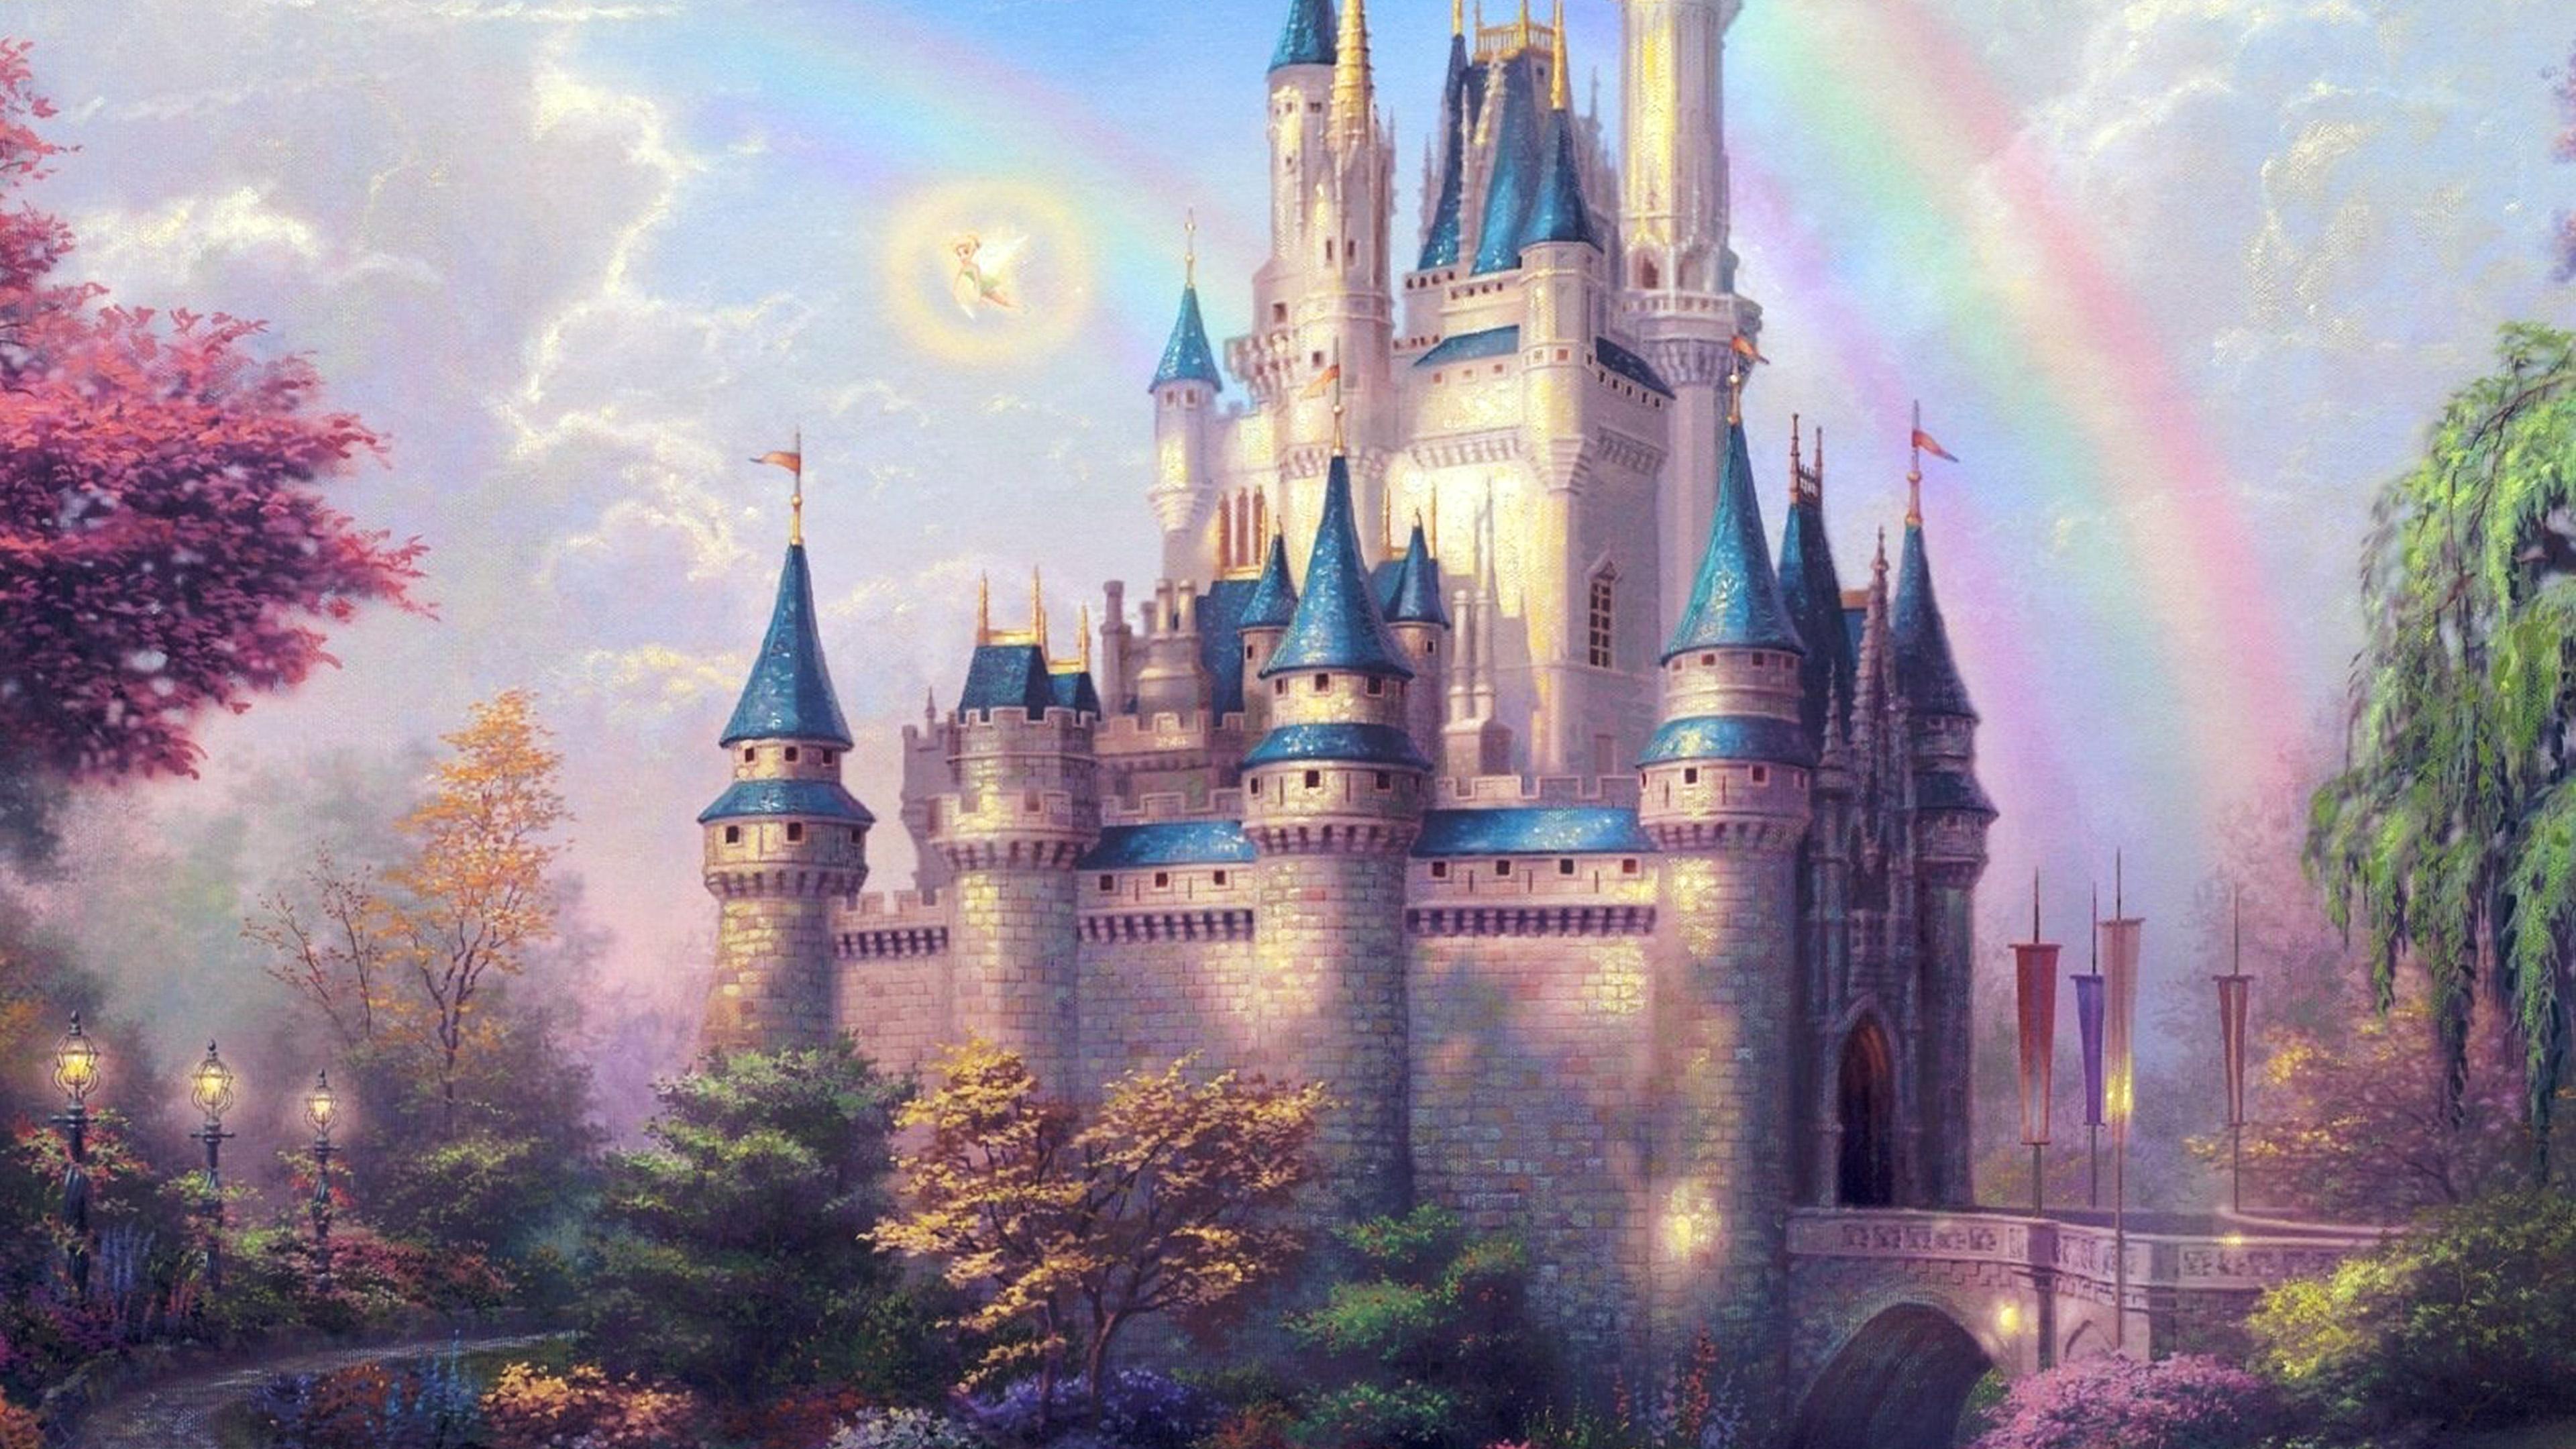 Such as png, jpg, animated gifs, pic art, symbol, blackandwhite, pic, etc. ap98-fantasy-castle-illustration-cute-disney-wallpaper